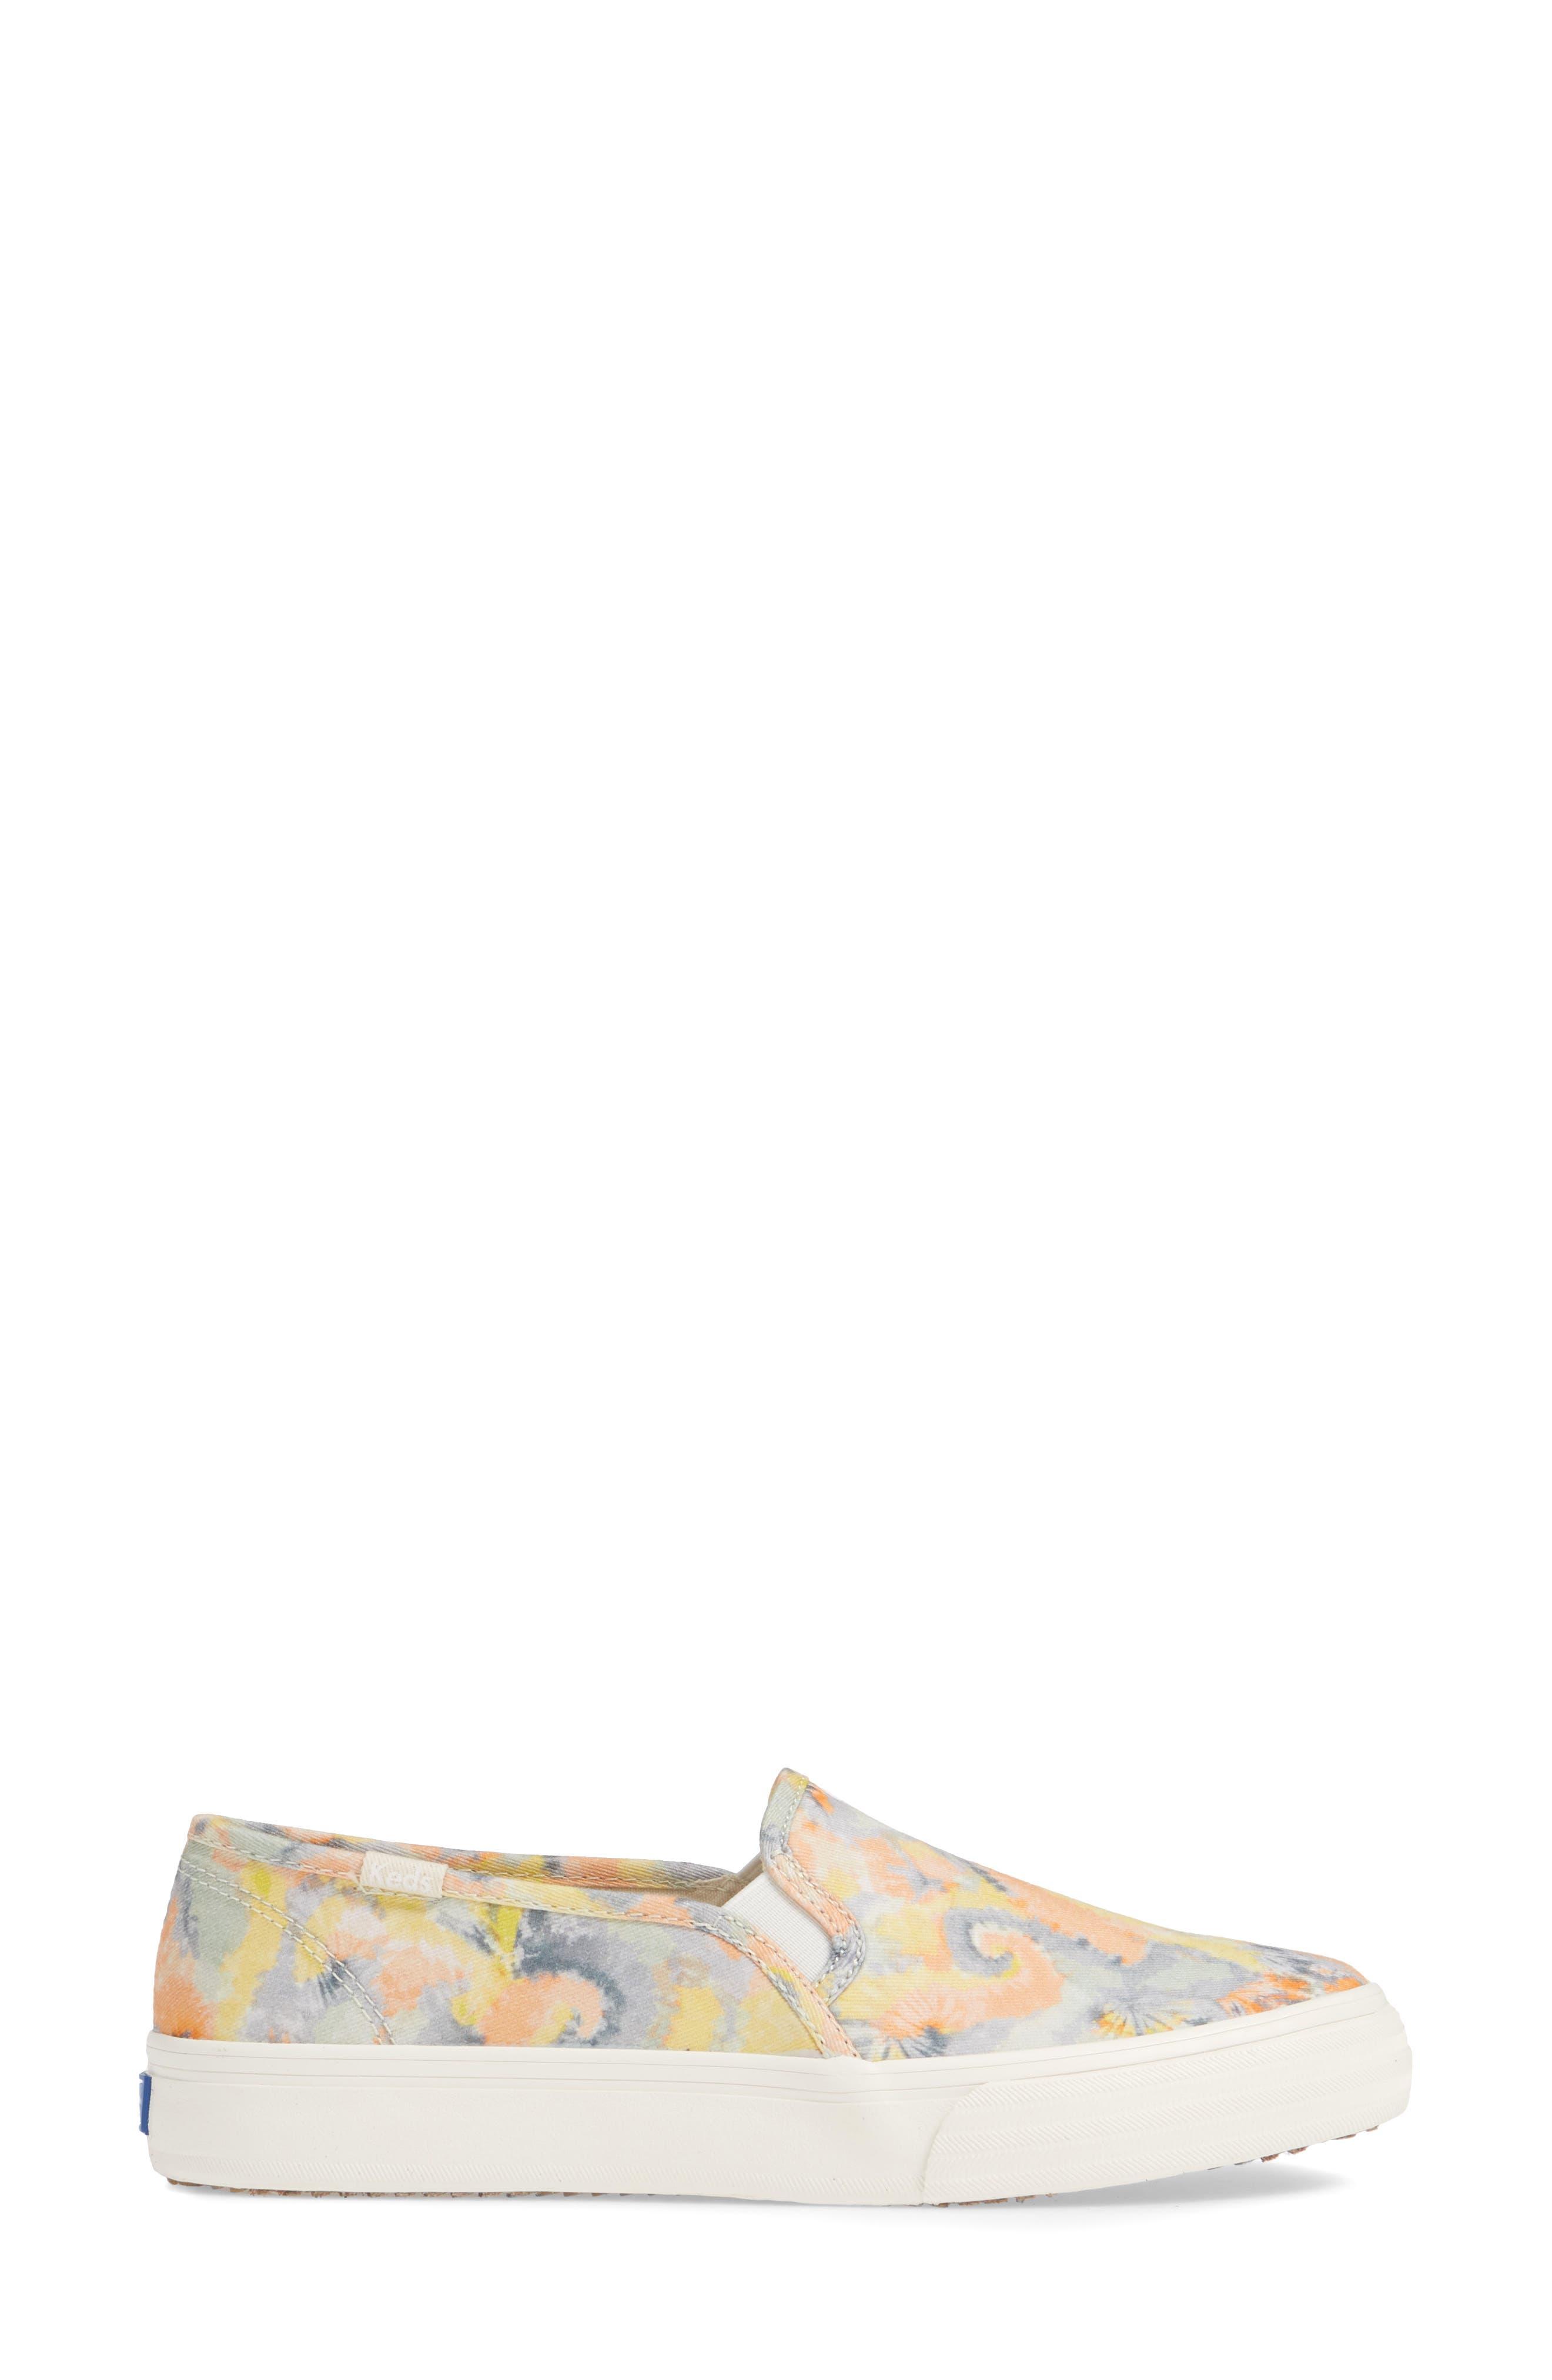 KEDS<SUP>®</SUP>, Double Decker Tie Dye Sneaker, Alternate thumbnail 3, color, PINK MULTI